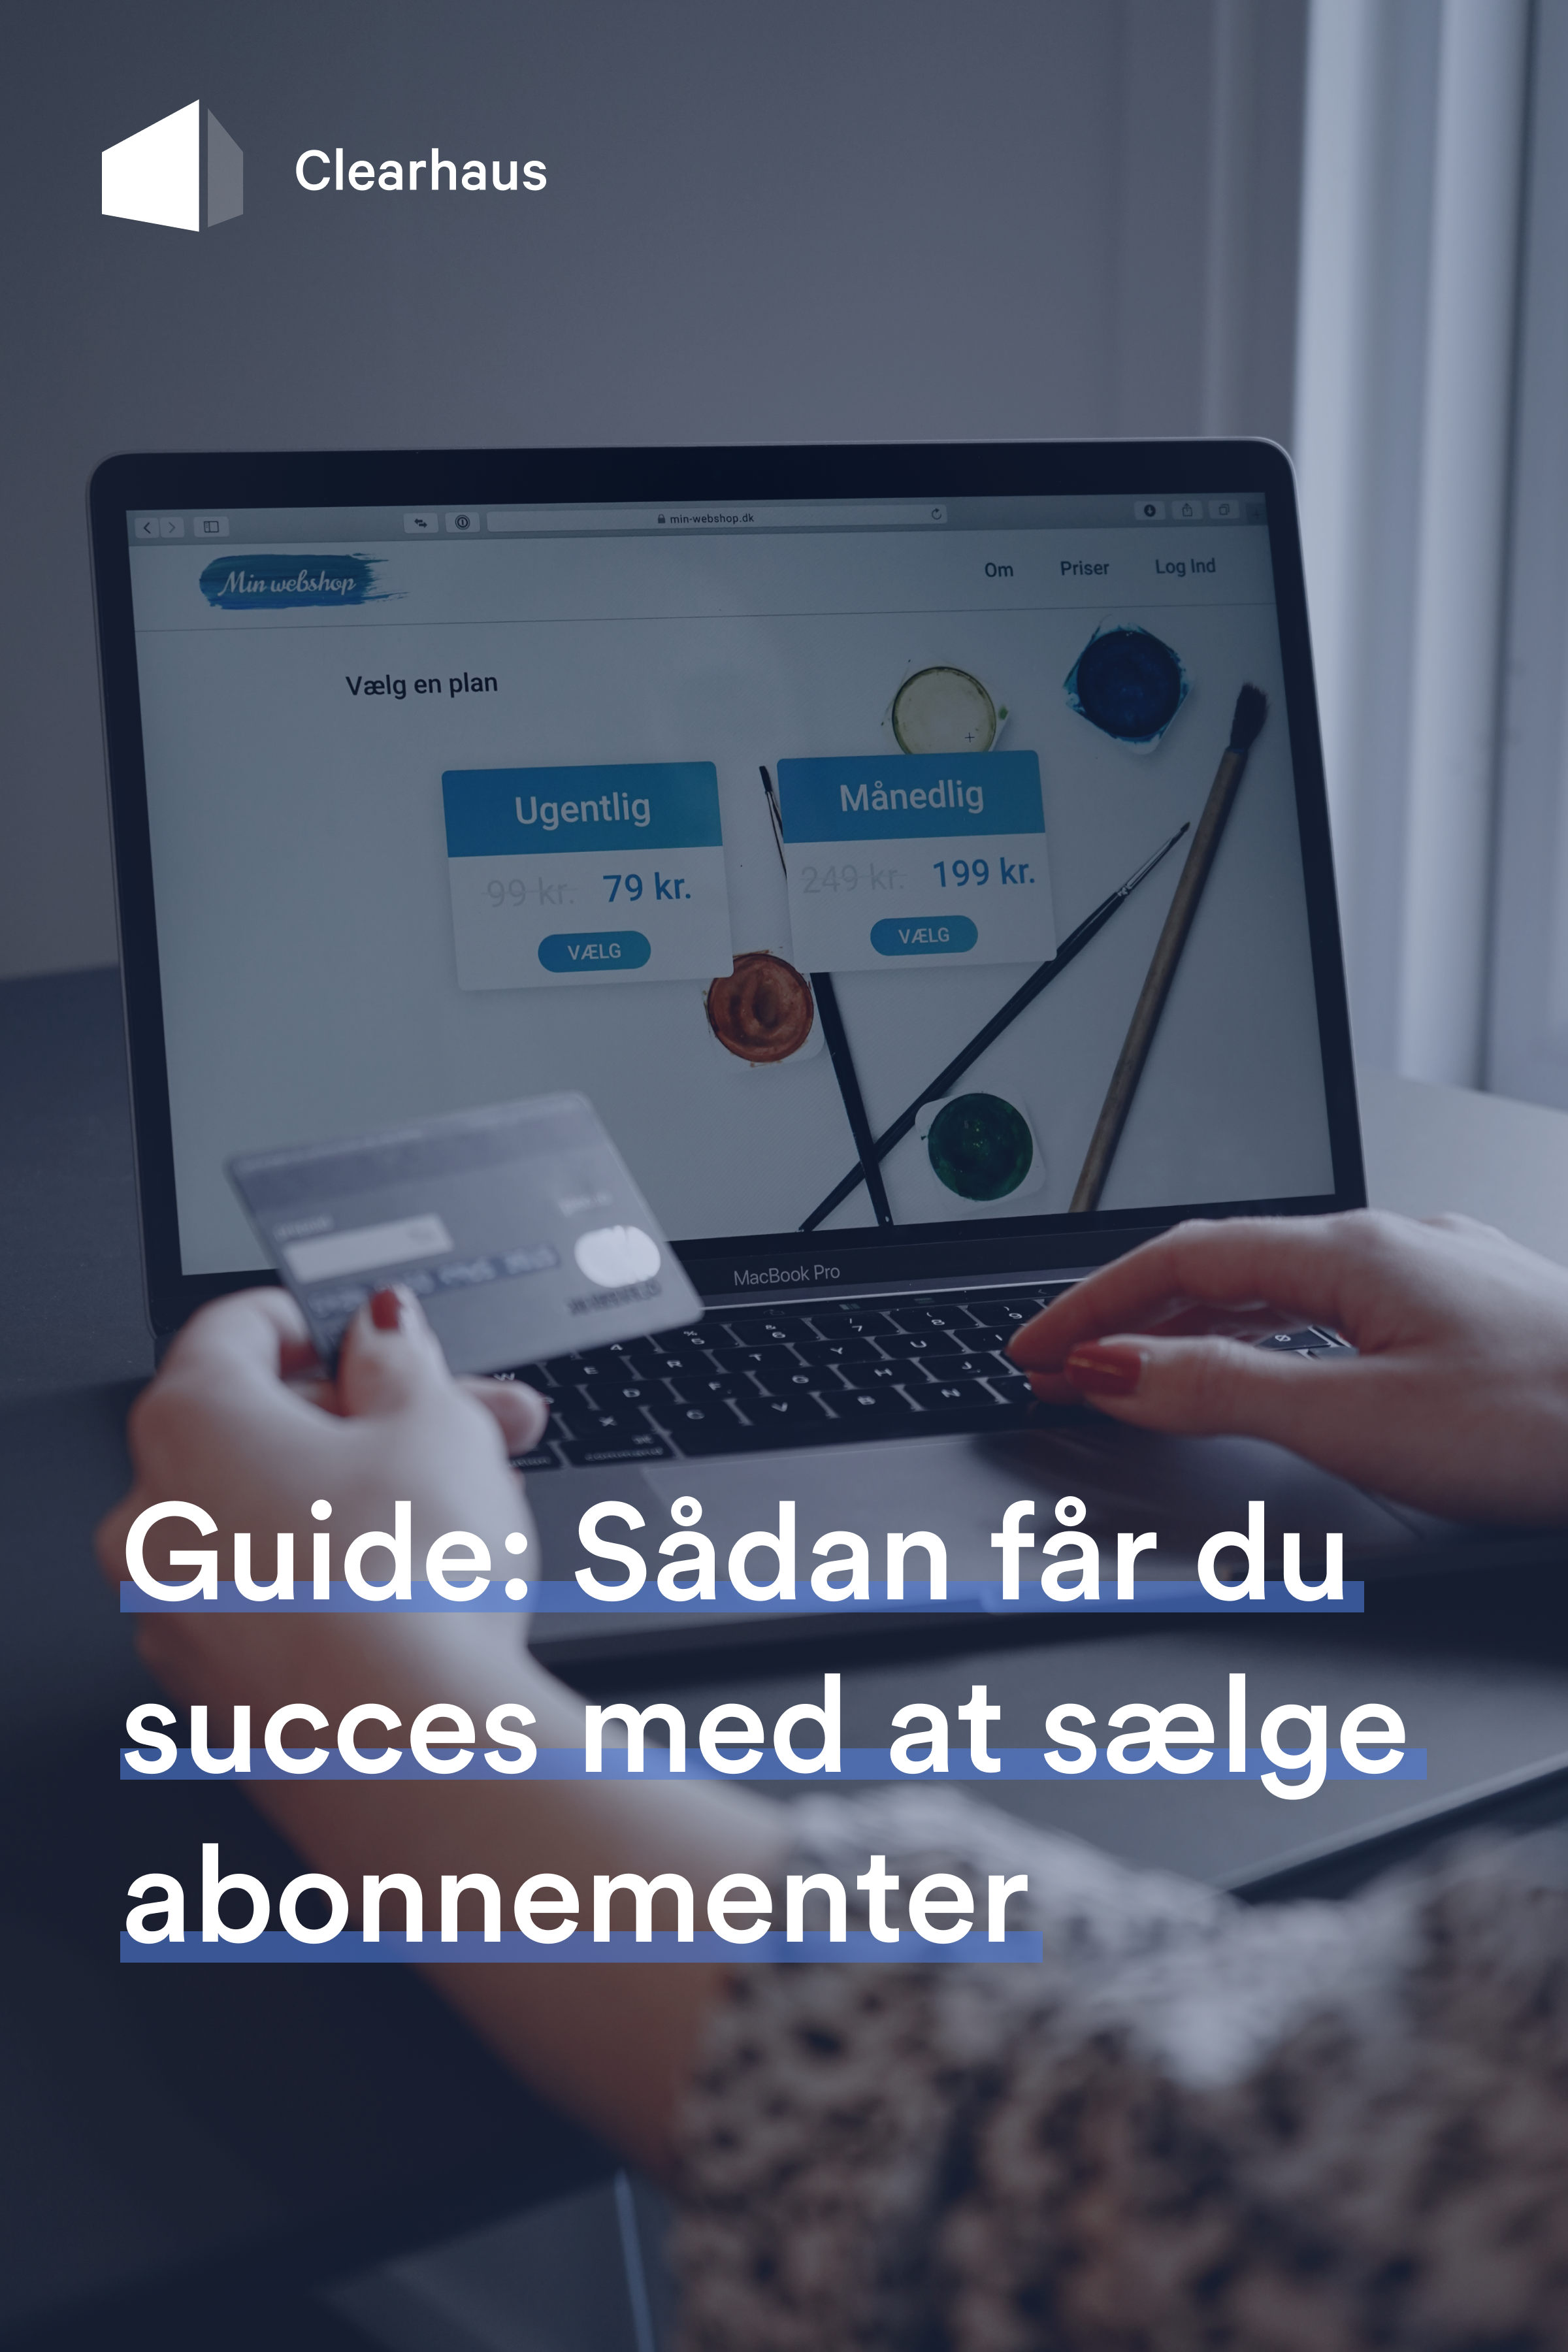 guide-saadan_faar_du_succes_med_at_saelge_abonnementer-front_page